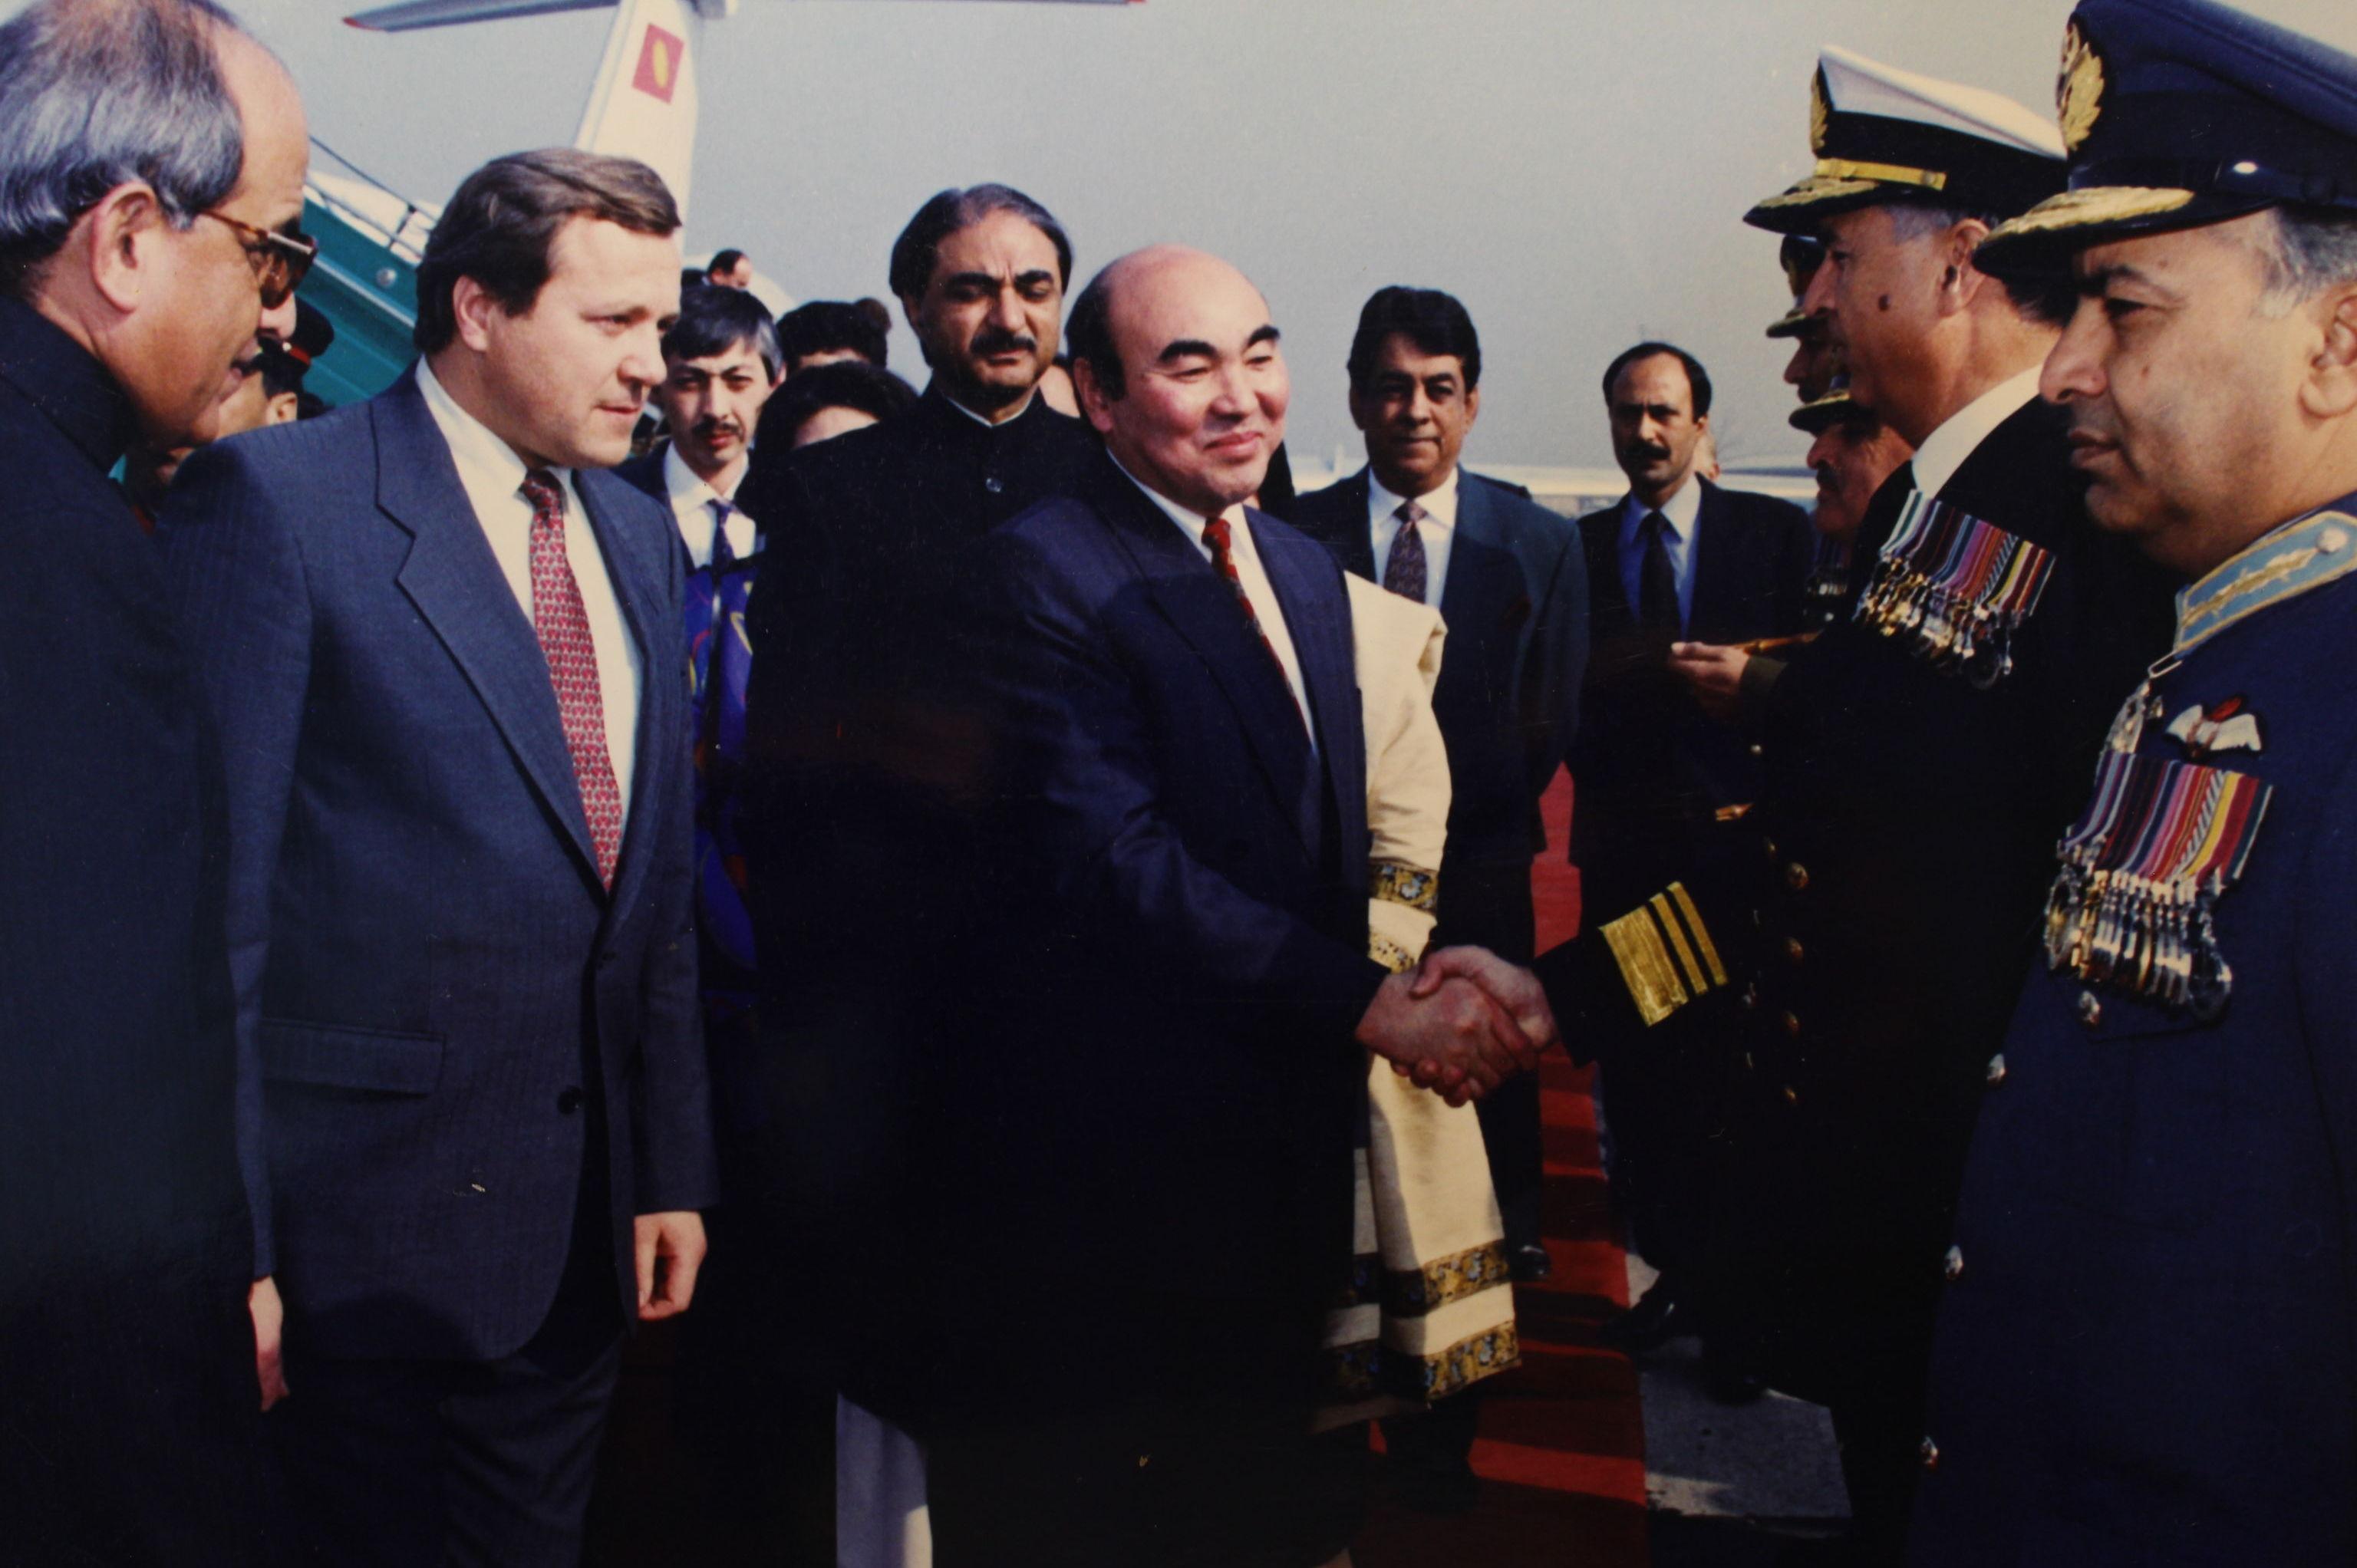 Визит Аскар Акаева в Пакистан.  Исламабад Декабрь1994.г